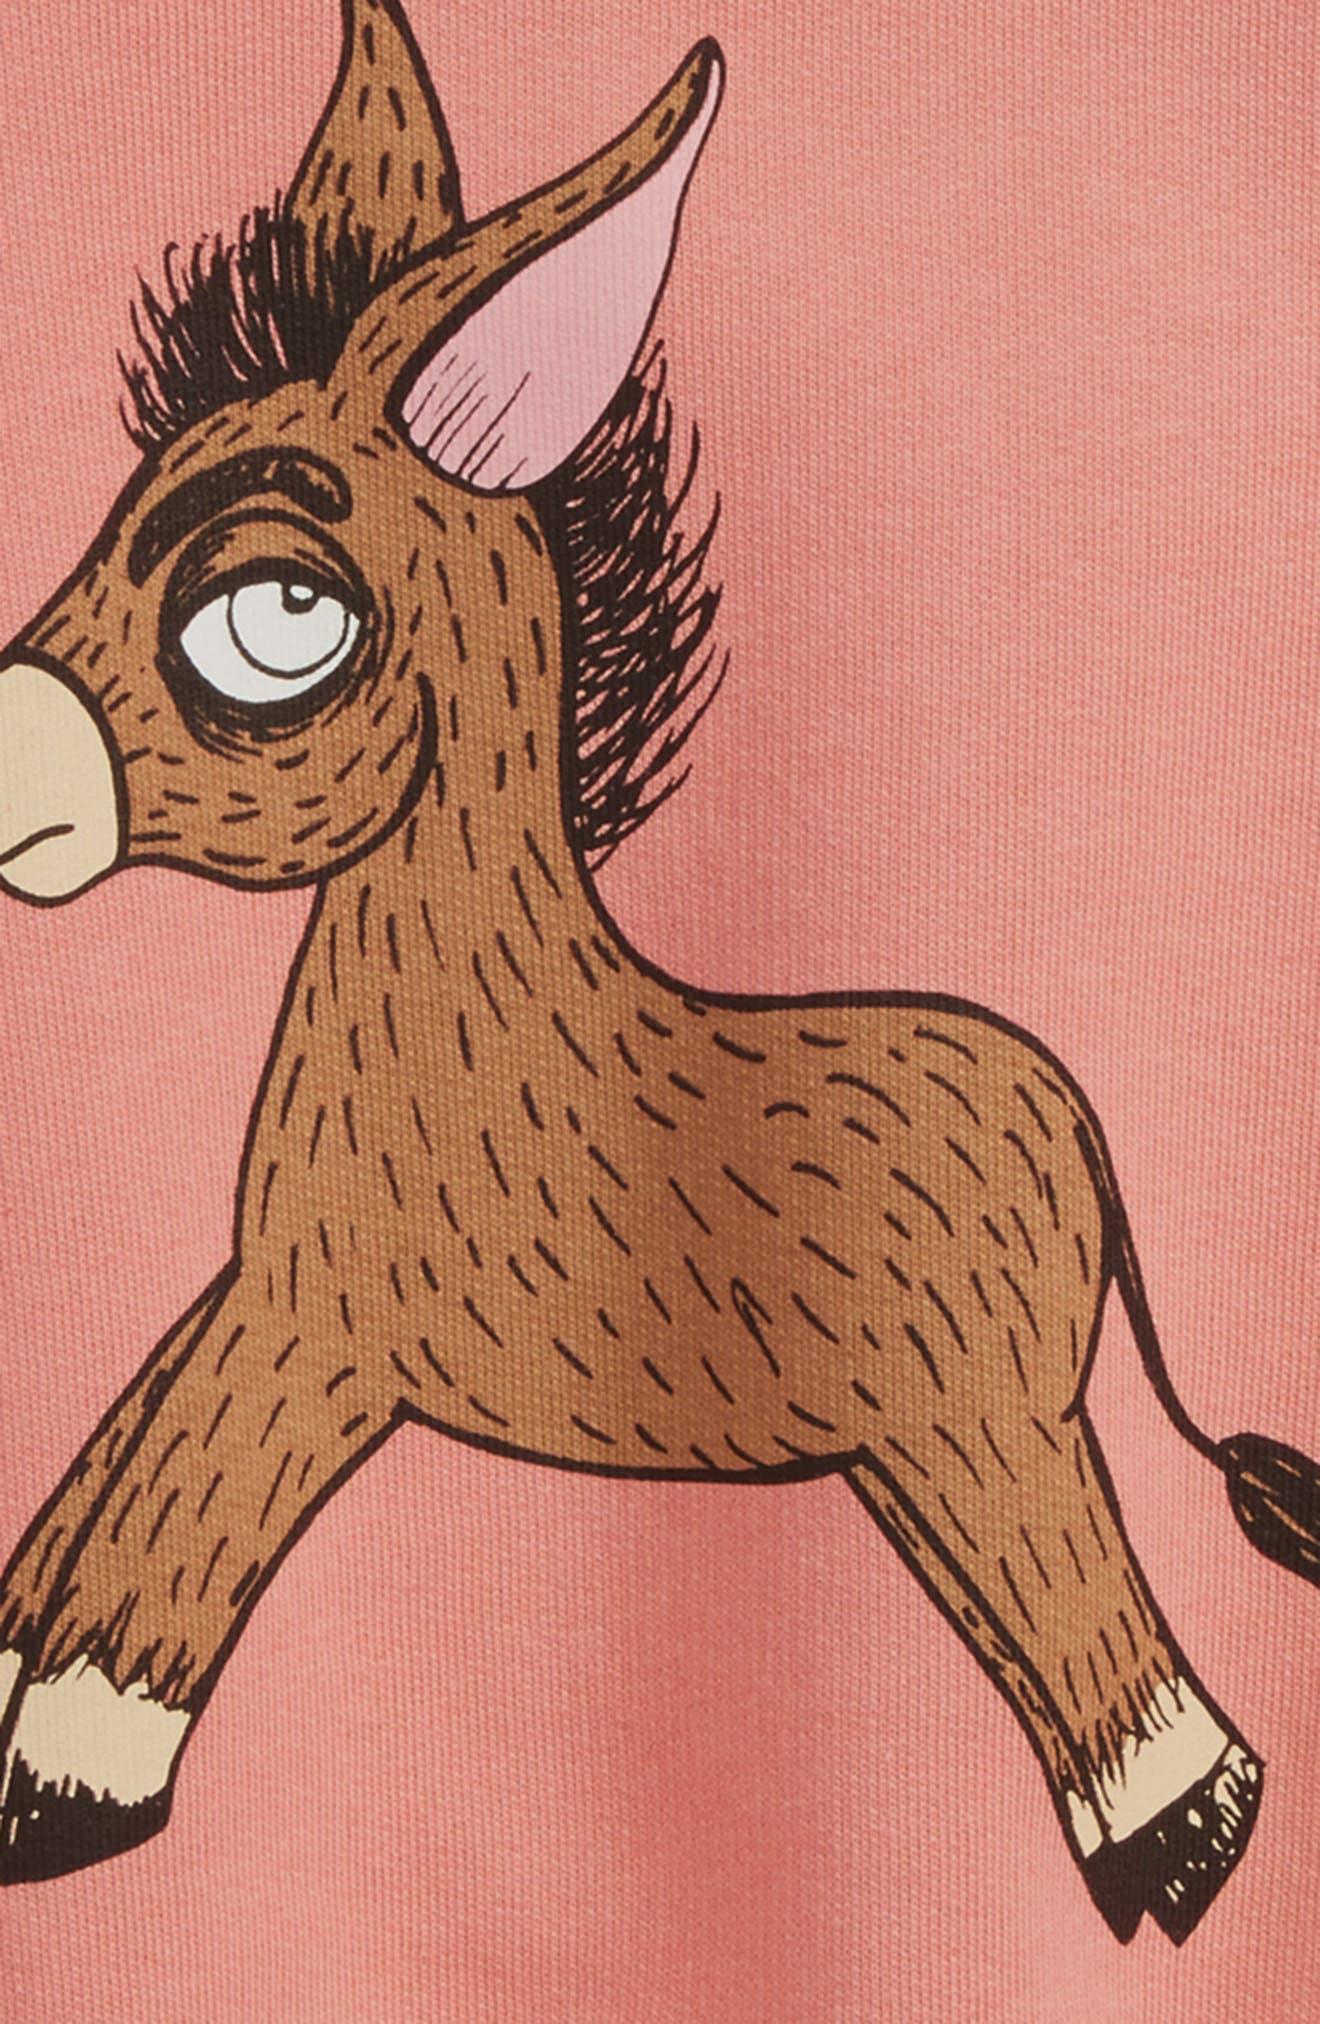 Donkey Organic Cotton Sweatshirt,                             Alternate thumbnail 2, color,                             Pink